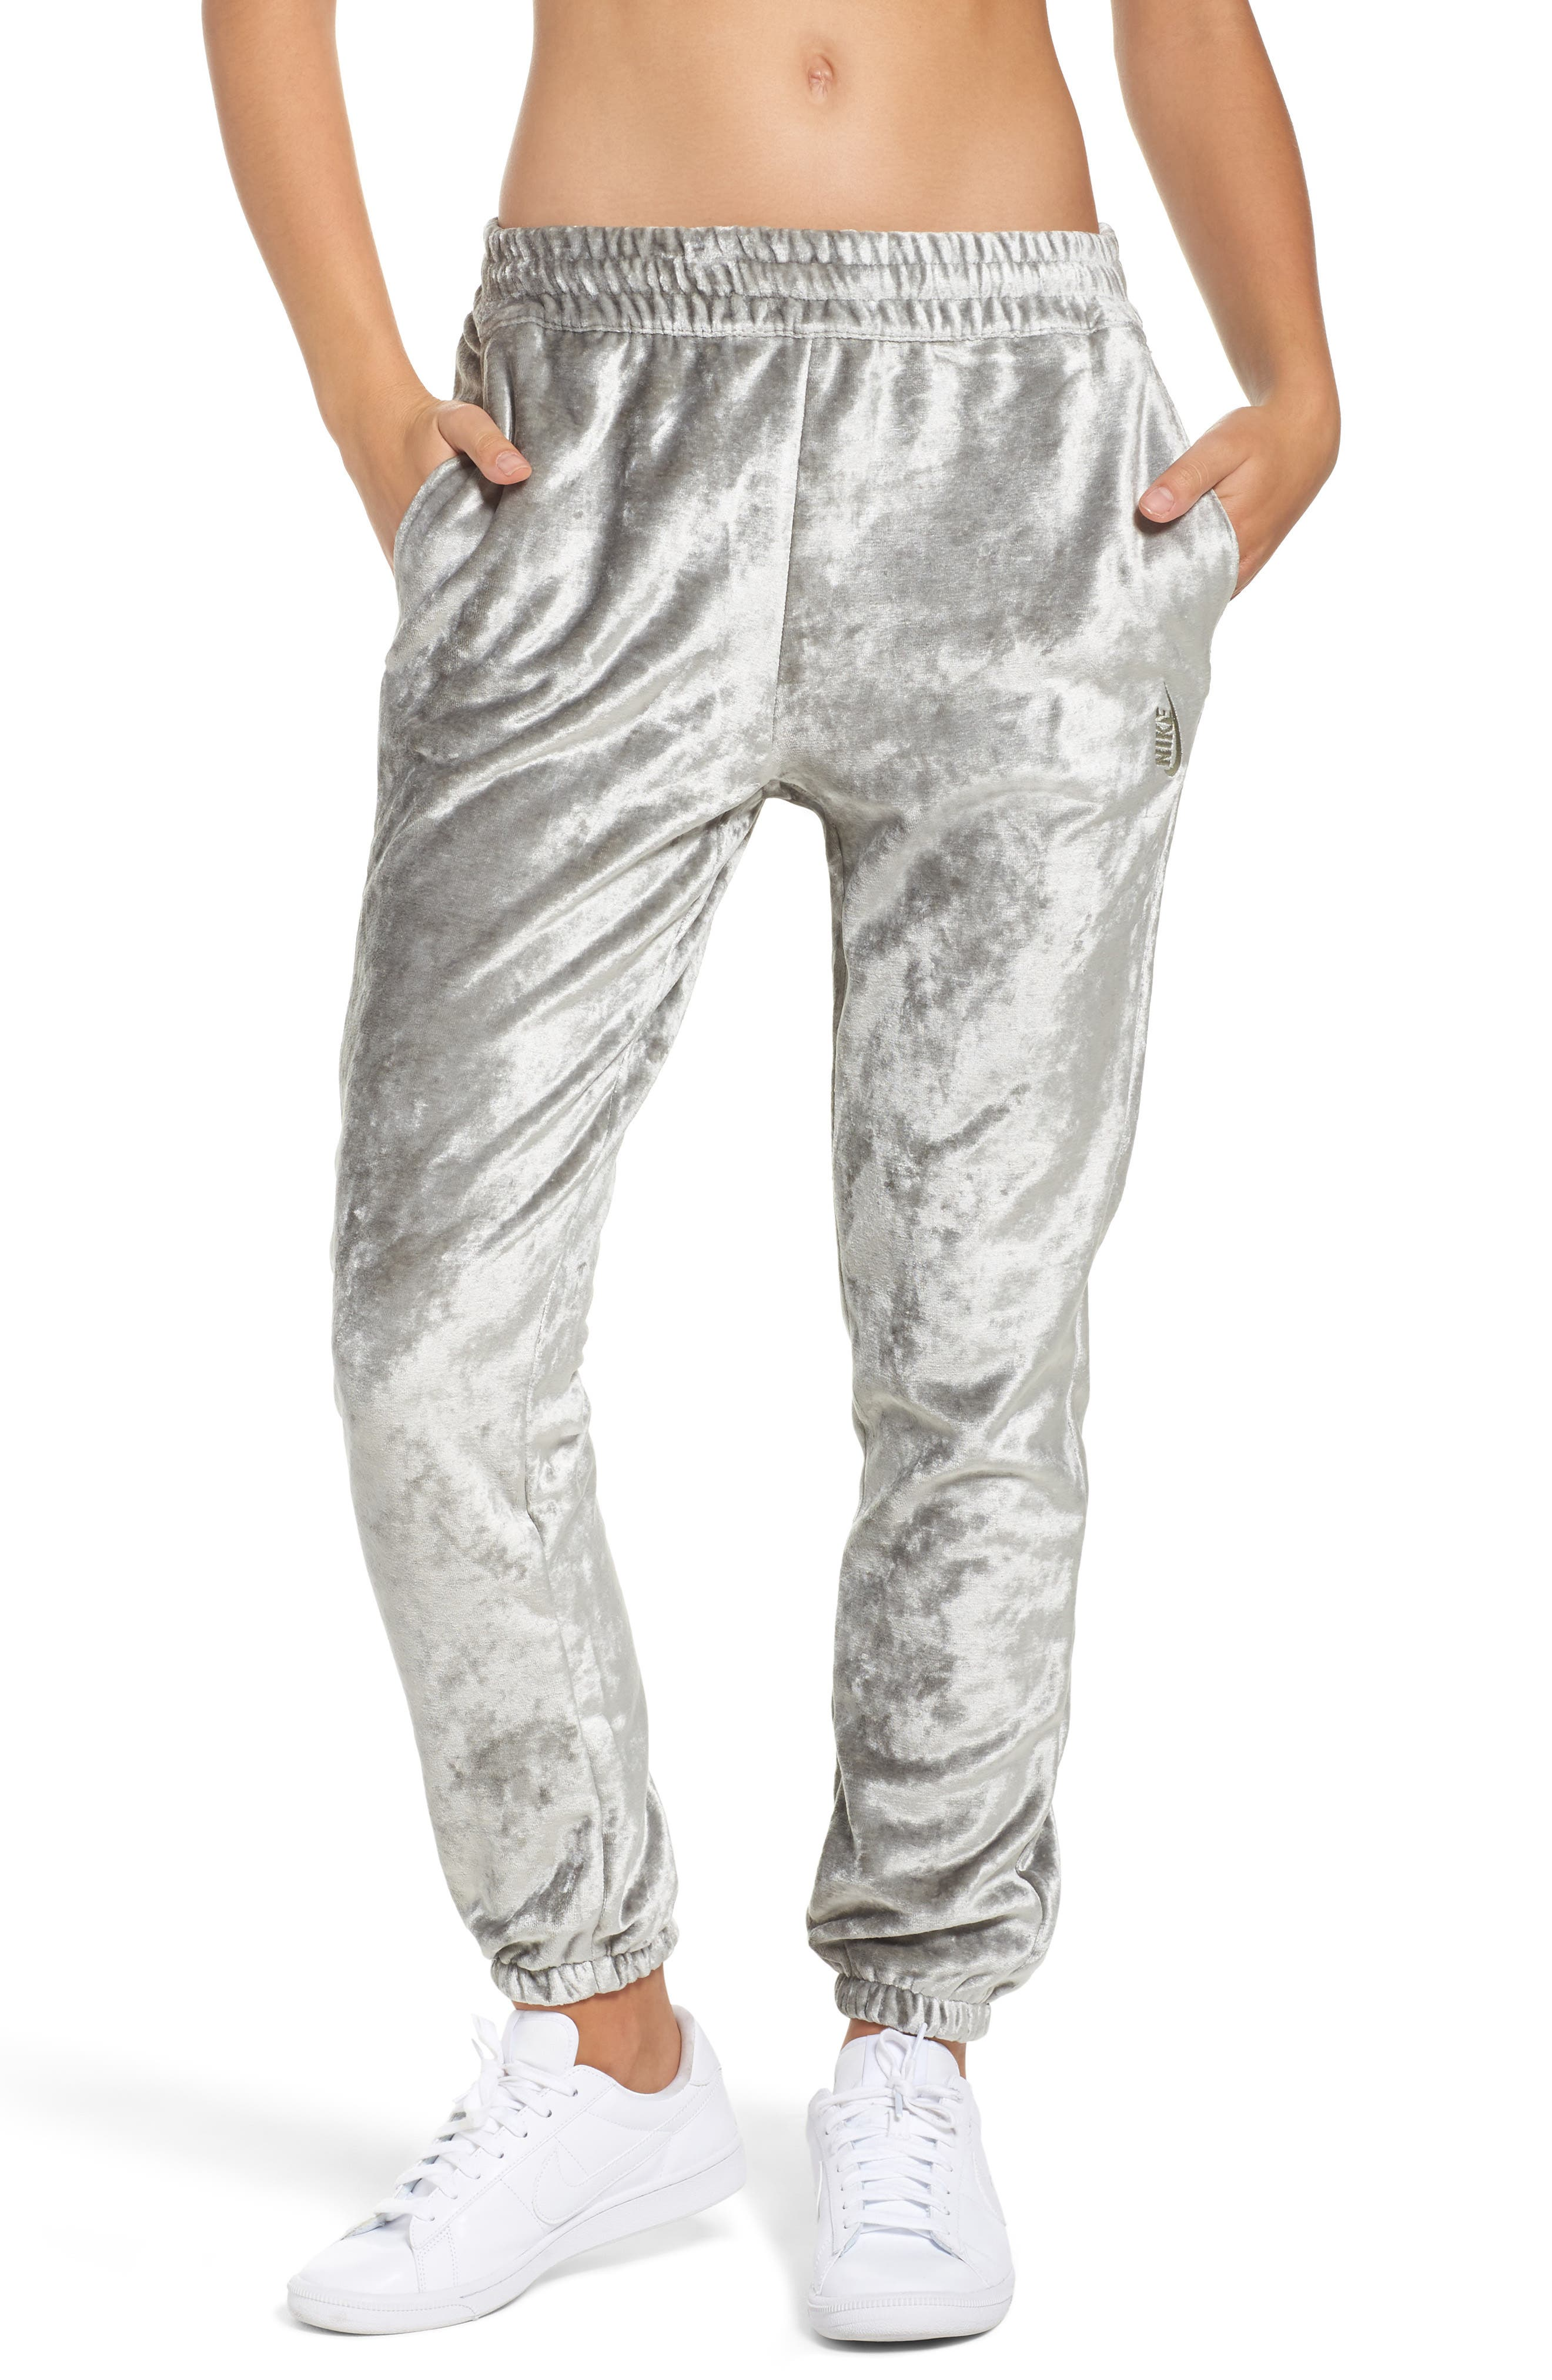 NIKE,                             NikeLab Essentials Women's Velour Pants,                             Main thumbnail 1, color,                             020